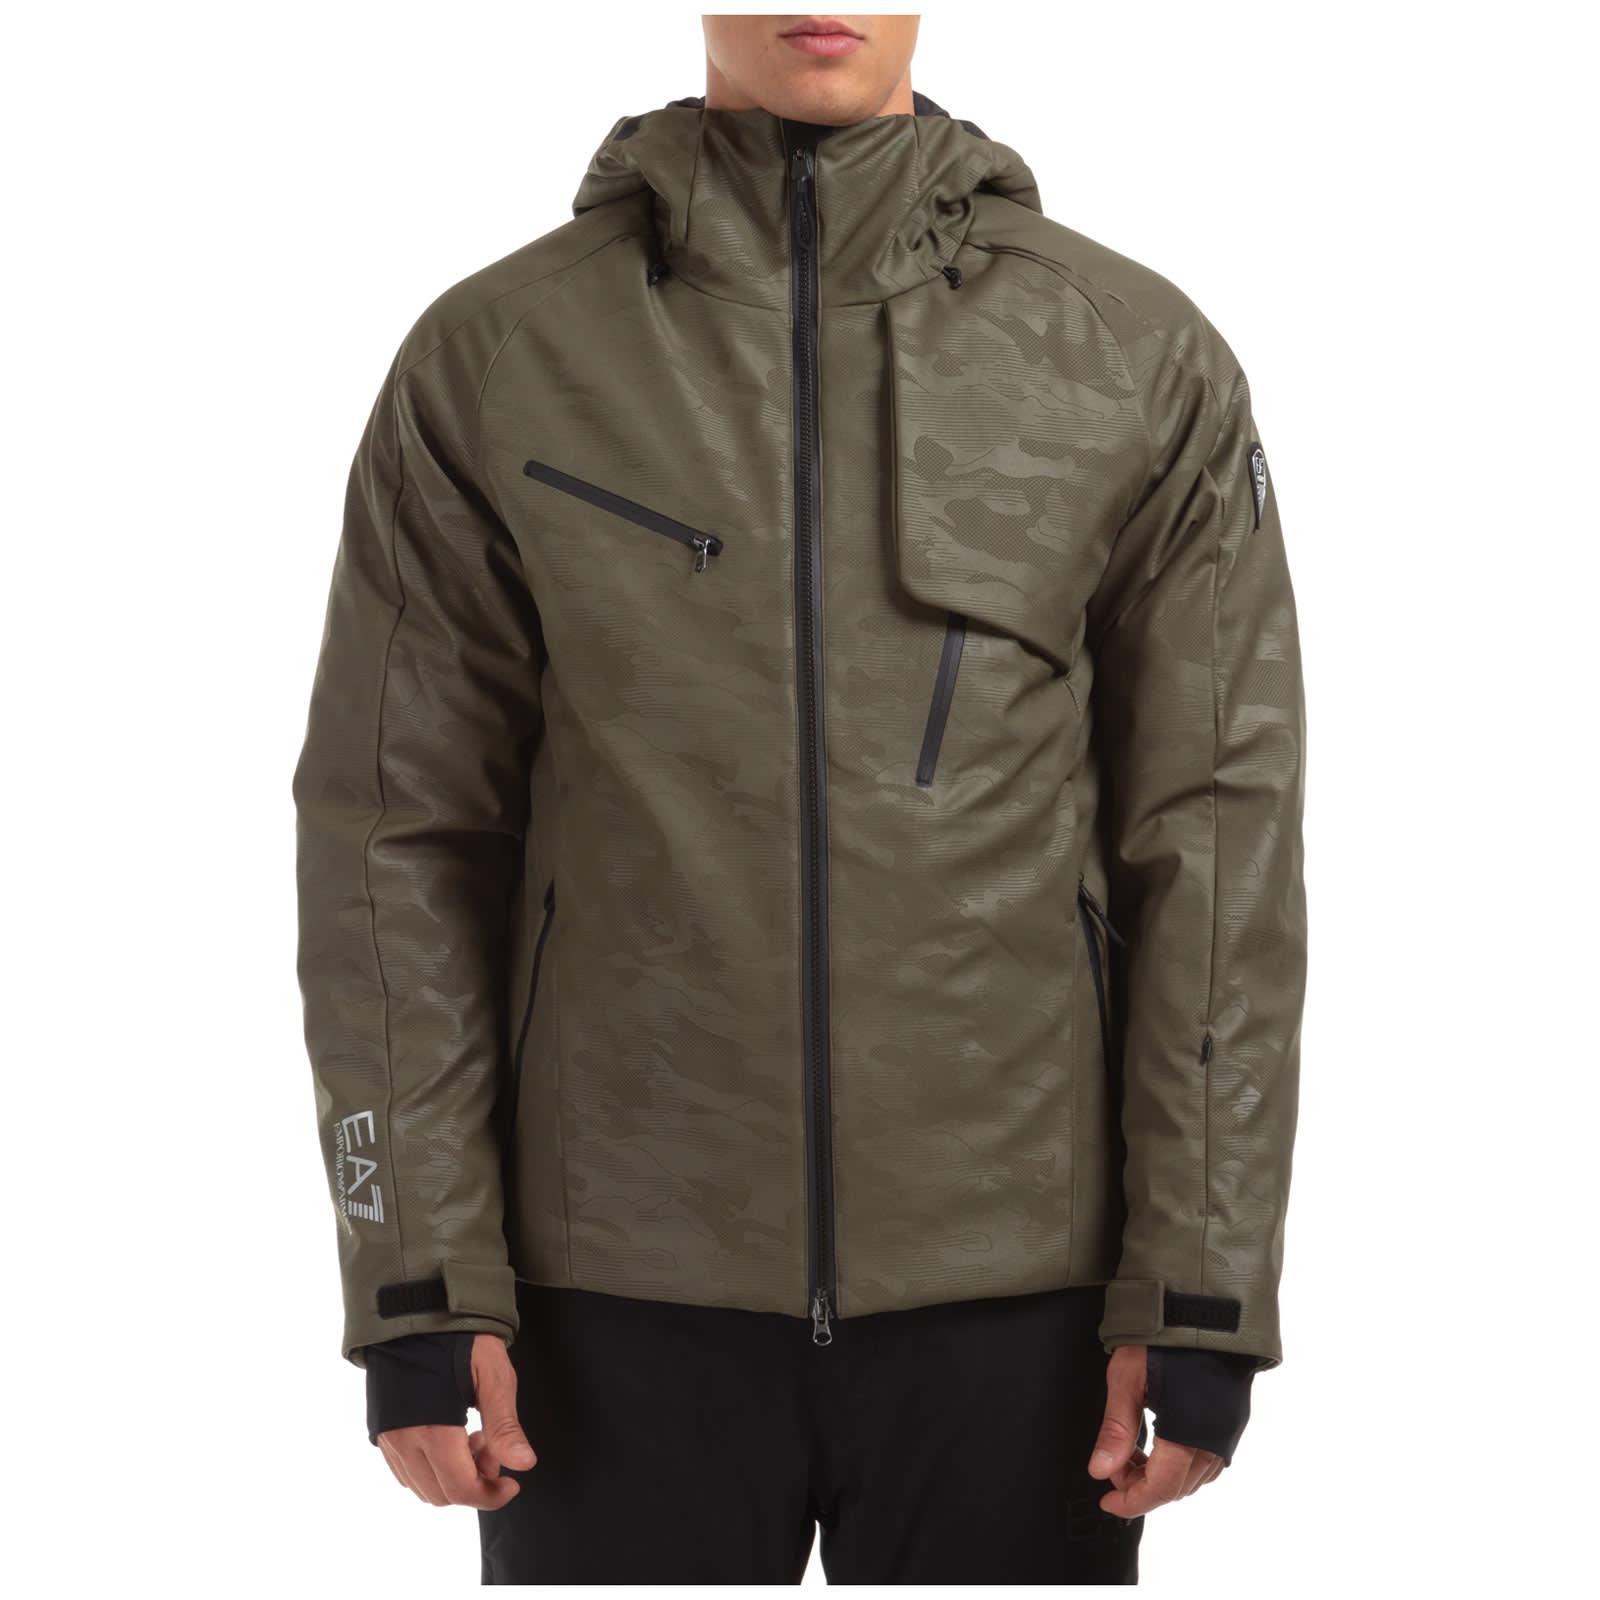 Emporio Armani Ea7 Textum 7 Ski Jackets